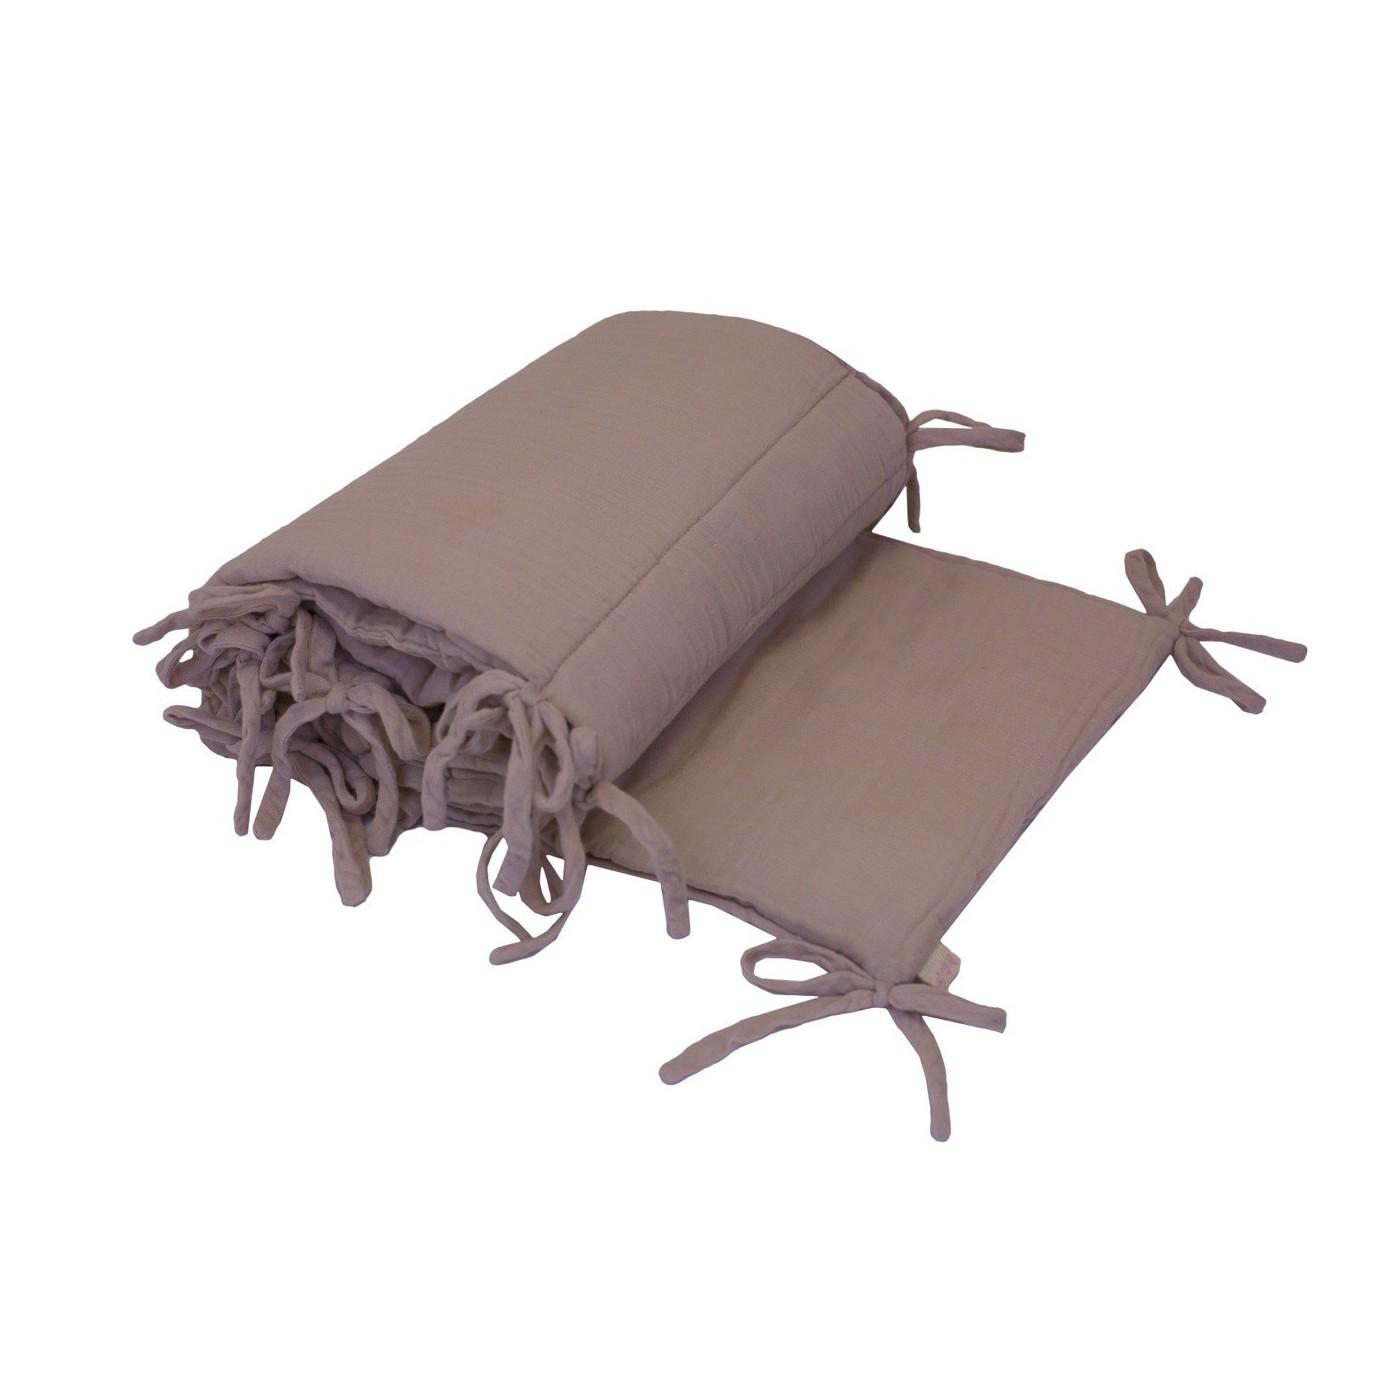 tour de lit vieux rose yadayada. Black Bedroom Furniture Sets. Home Design Ideas